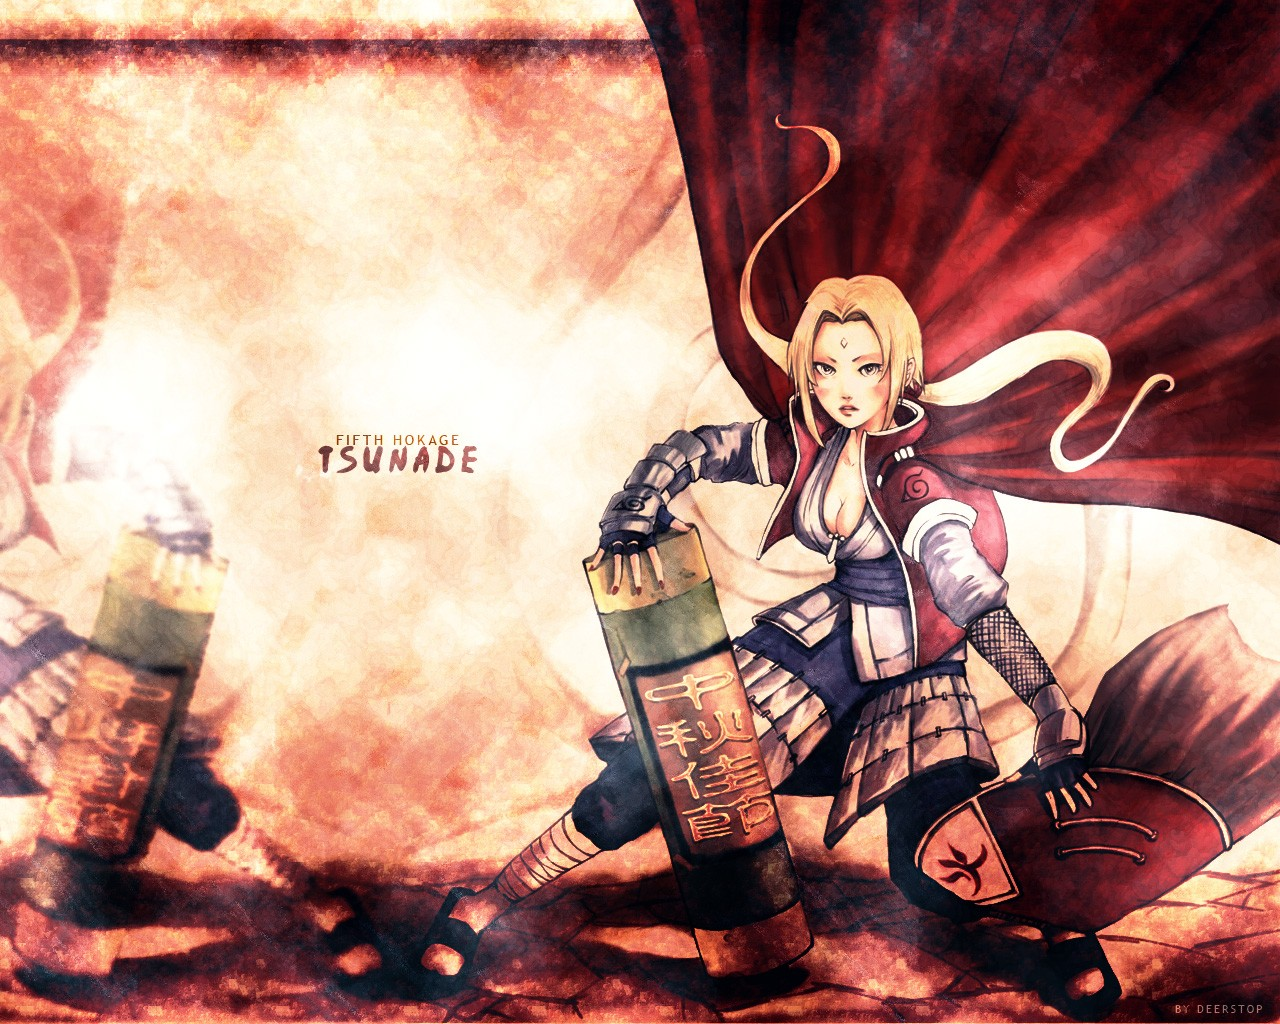 Download Tsunade Naruto Wallpaper 1280x1024 Wallpoper 1280x1024